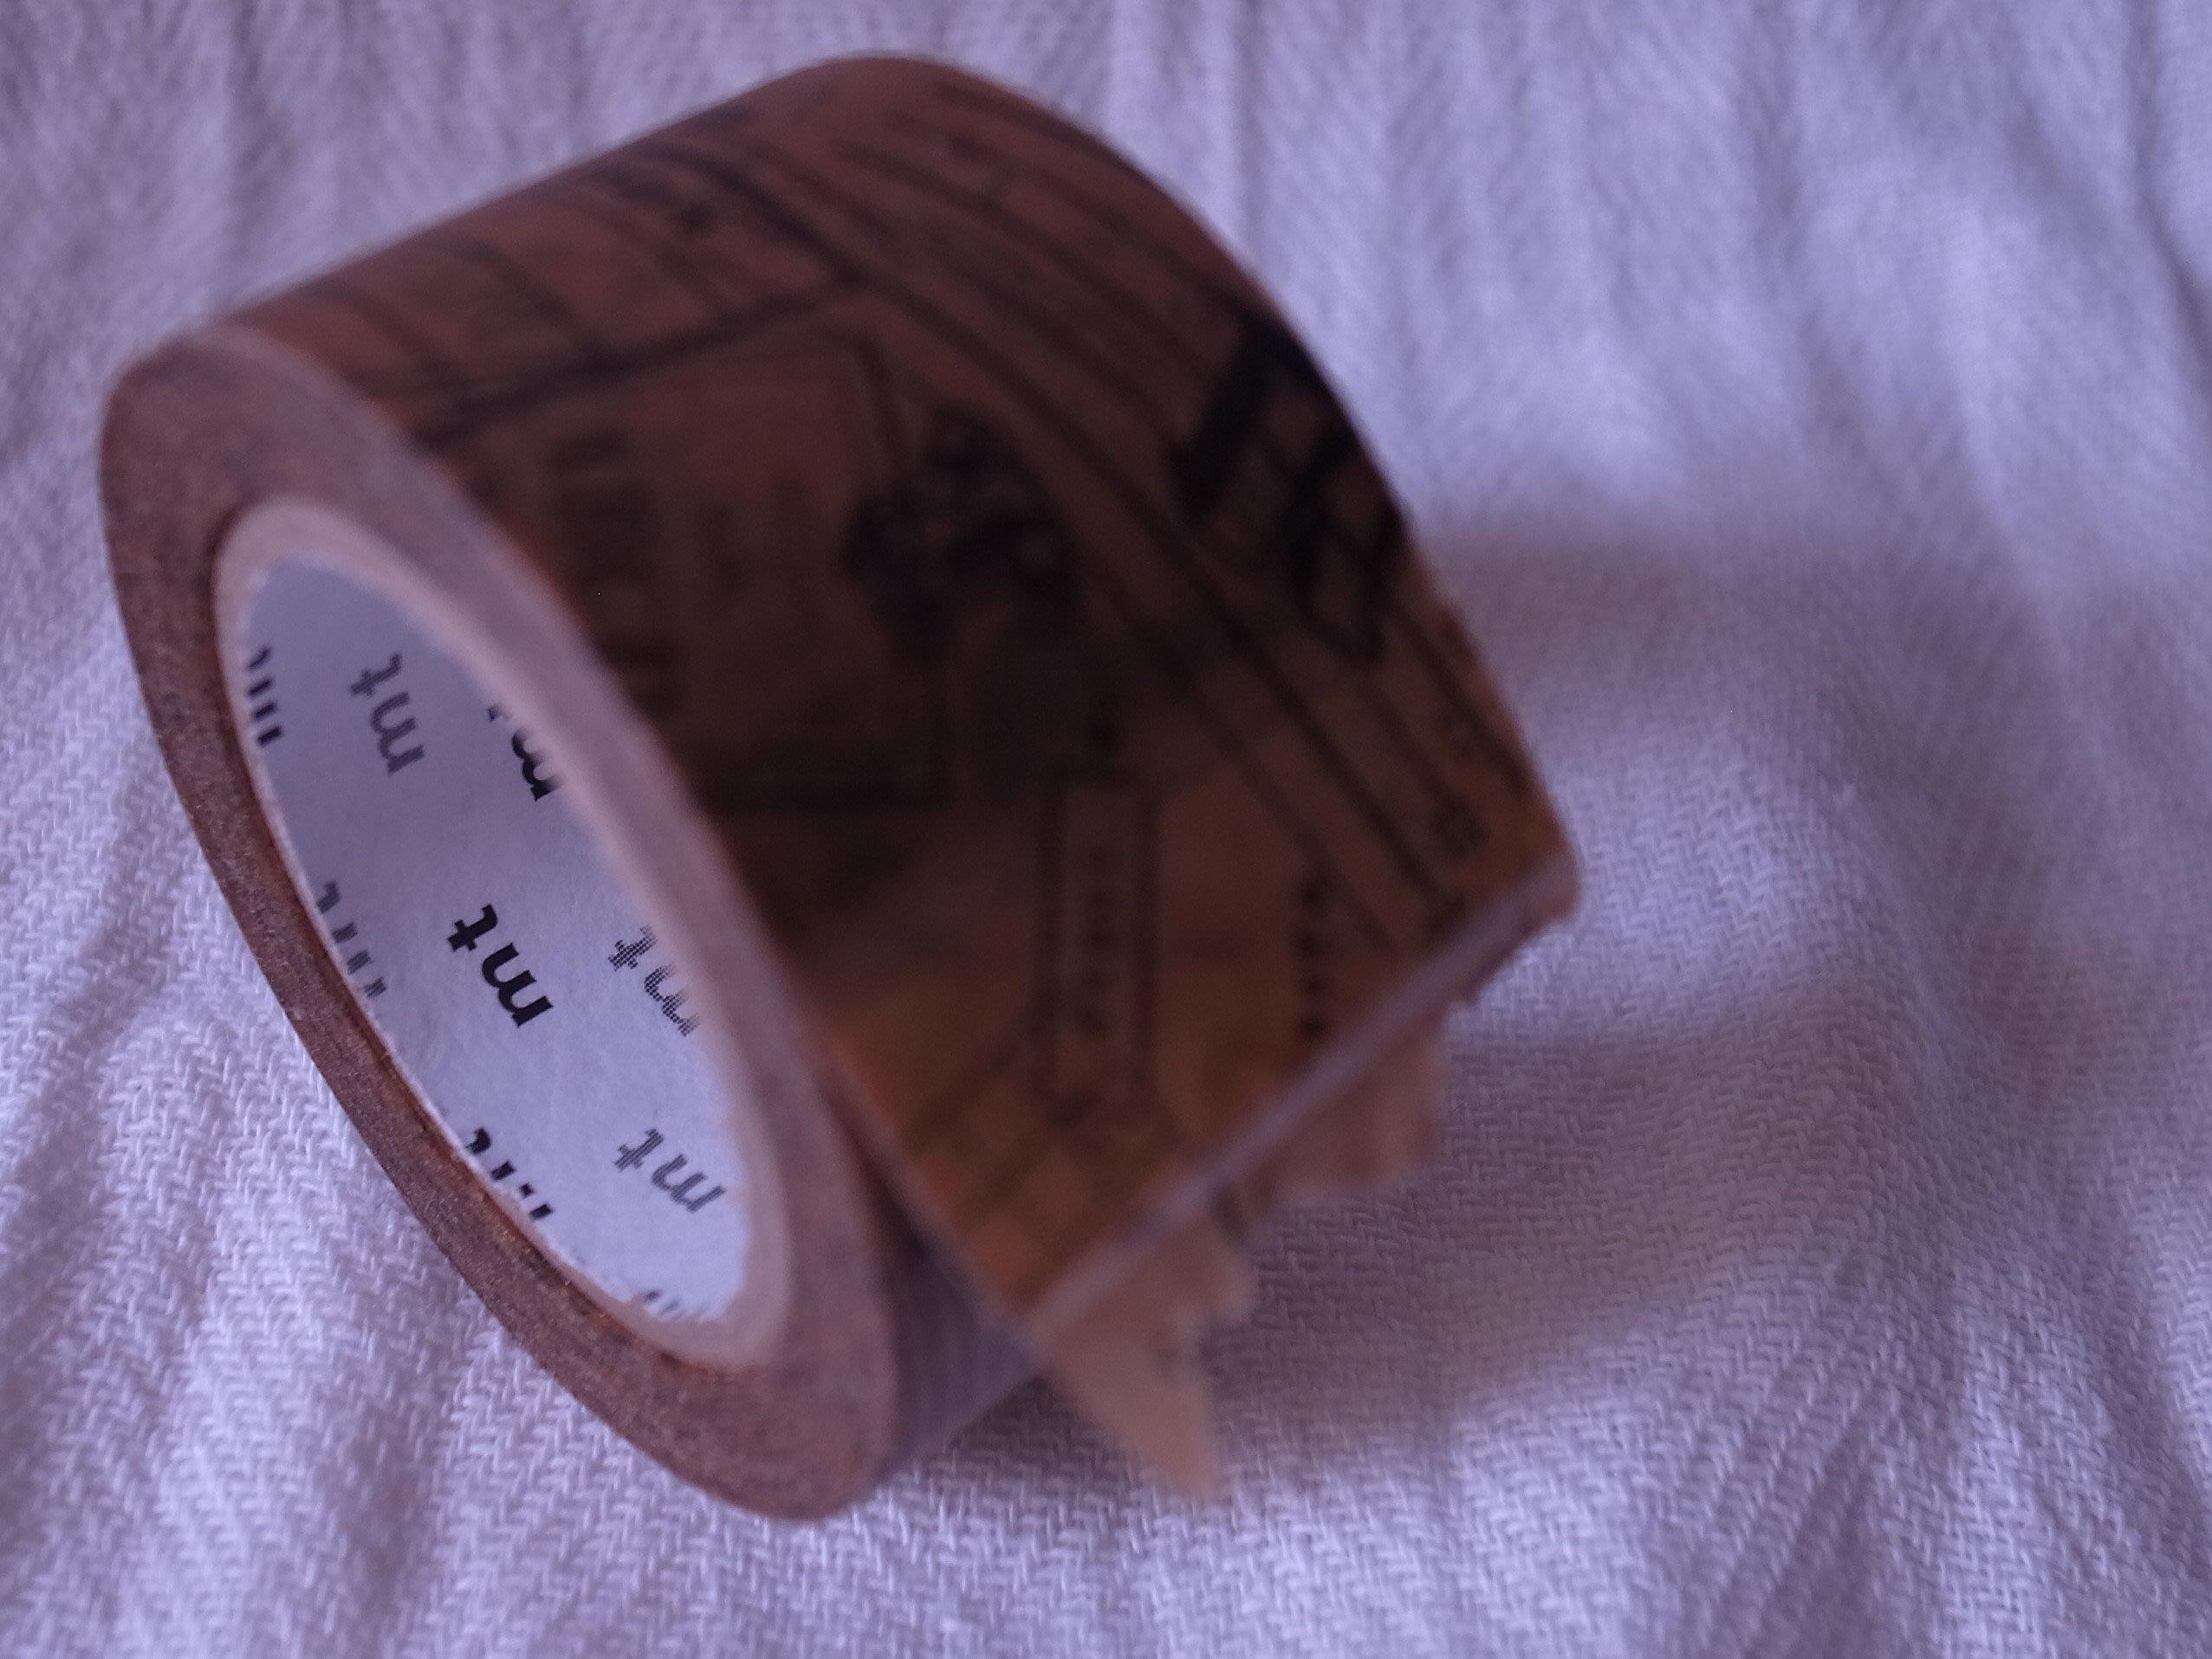 mt紙膠帶 Masking Tape/ Limited Edition/ 印刷物